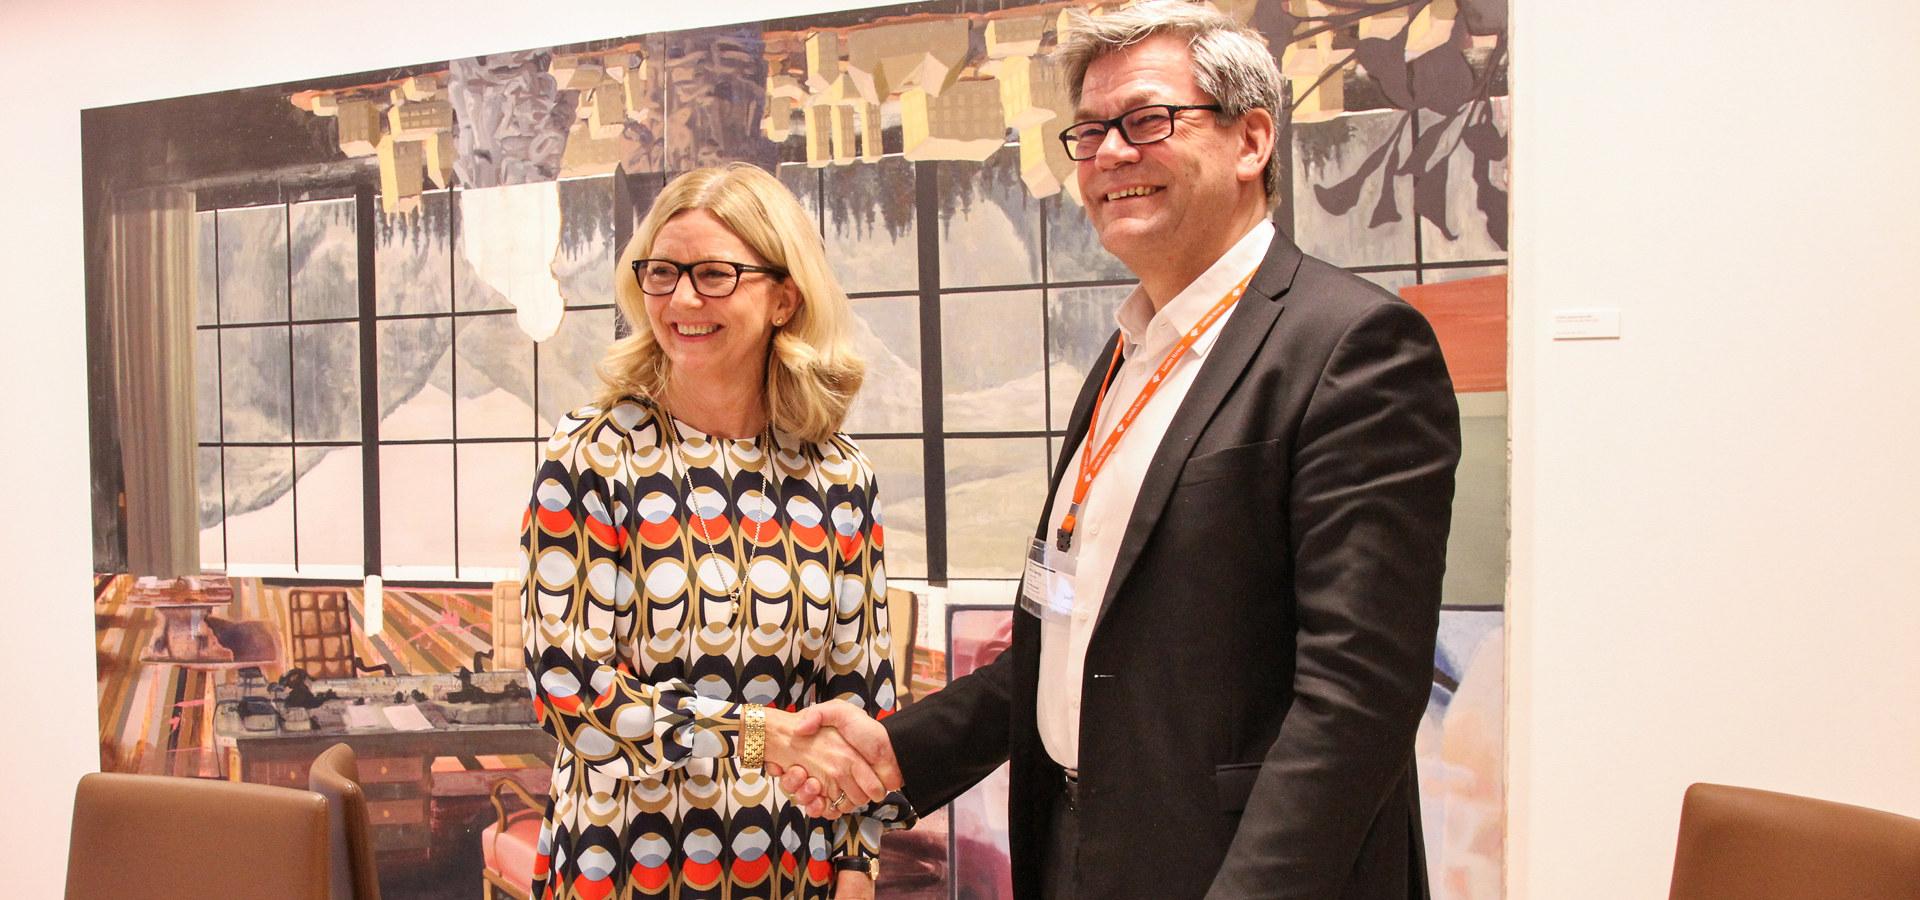 Managing Director Kristin Færøvik i Lundin Norway og Arild Selvig, salgssjef subsea i TechnipFMC Norge, under signering av kontrakt på Luno II-feltet.